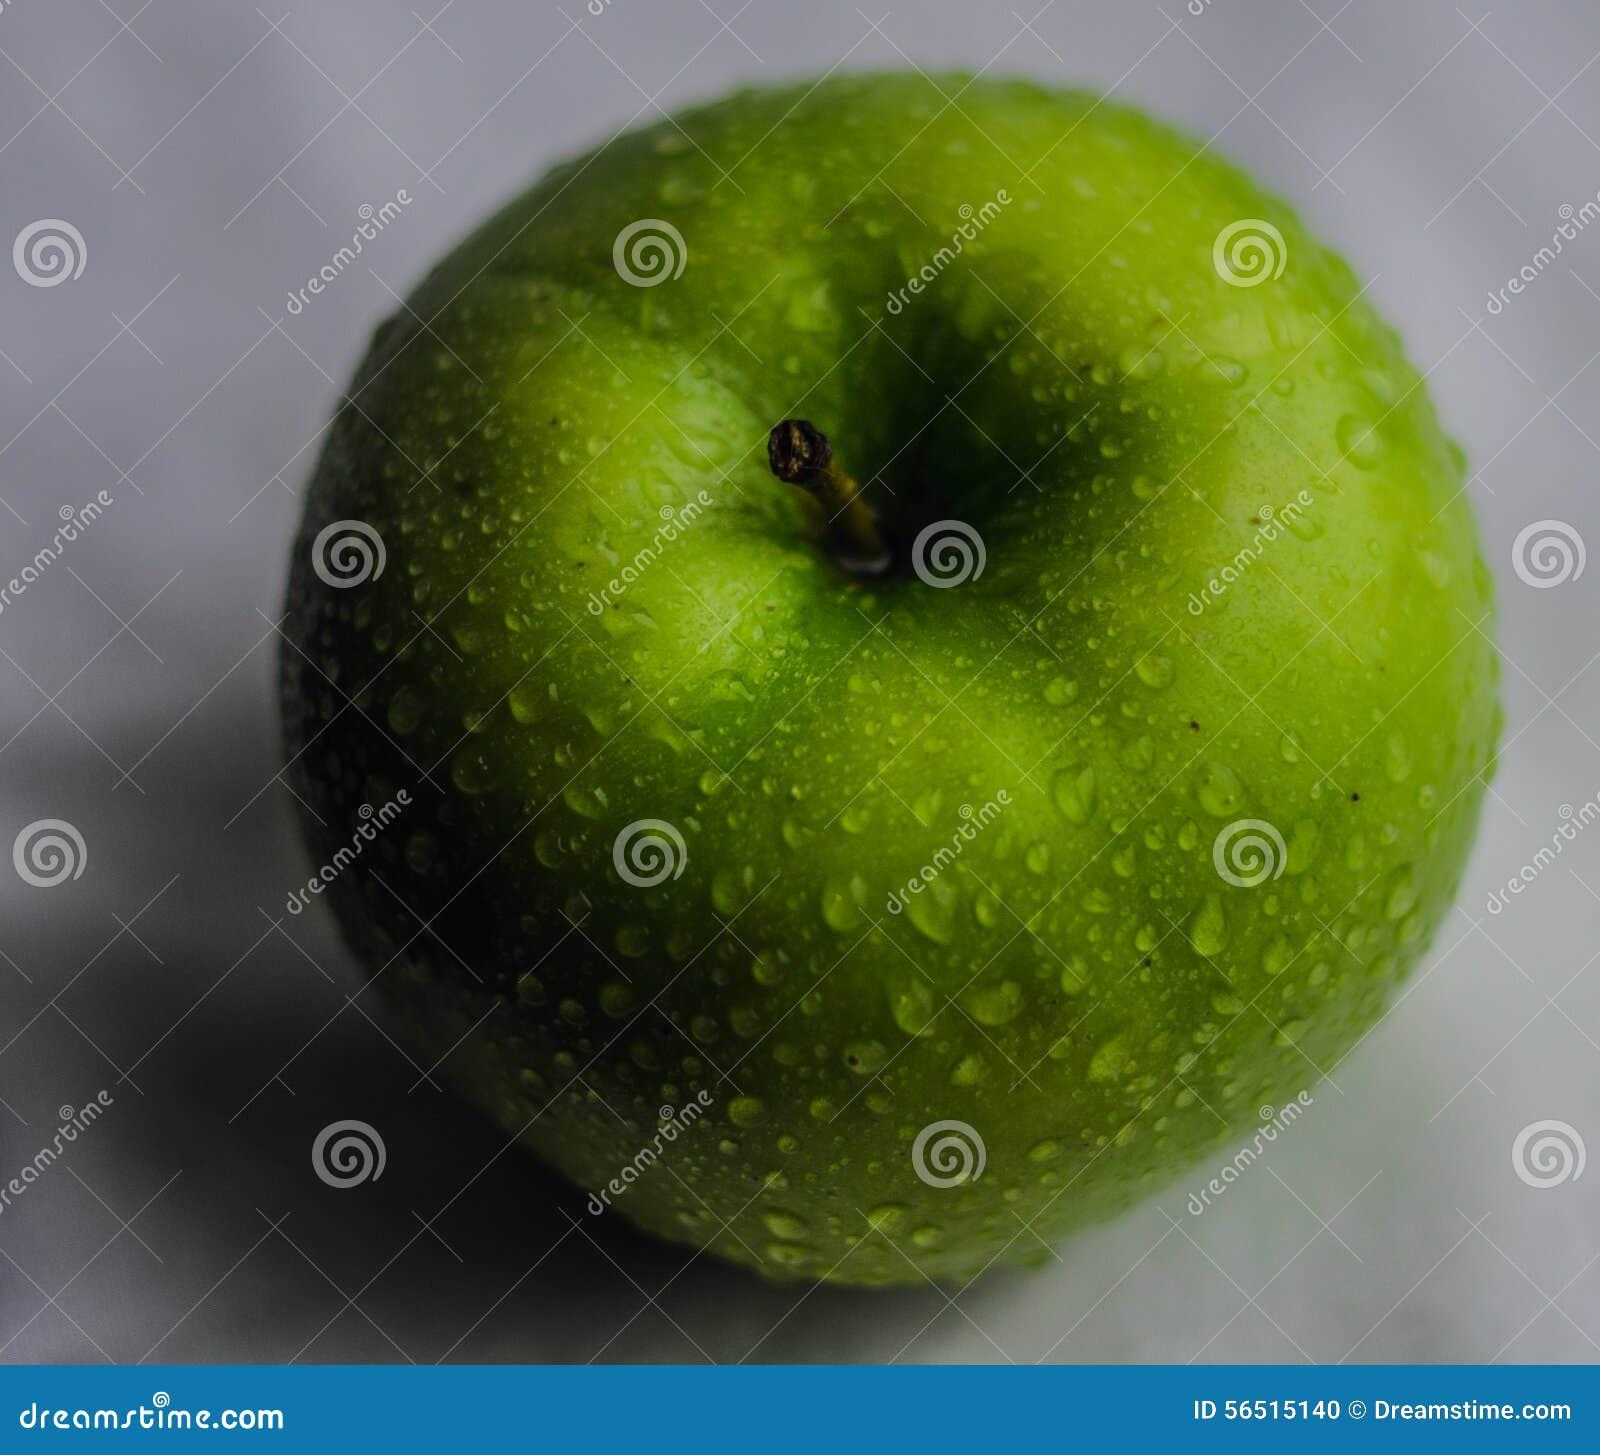 Green juicy apple